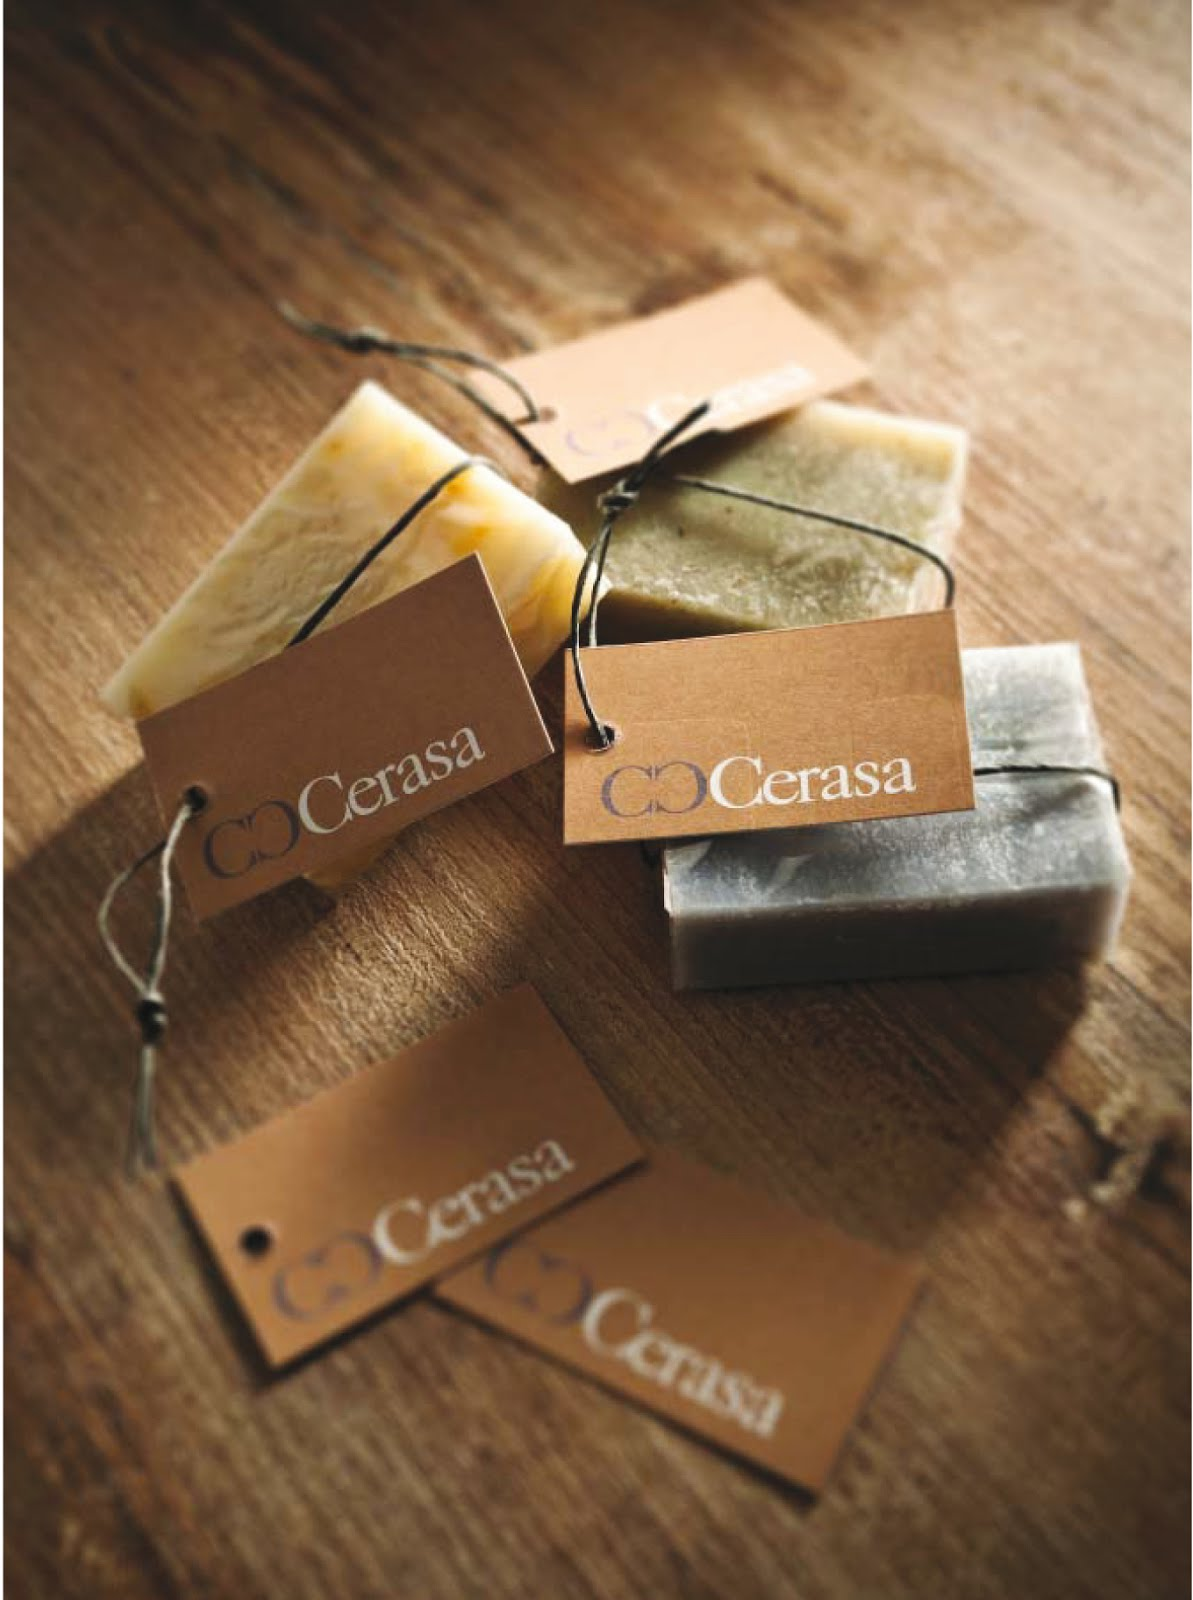 Arredo e design novit cerasa saponi tappeti for Carta d arredo